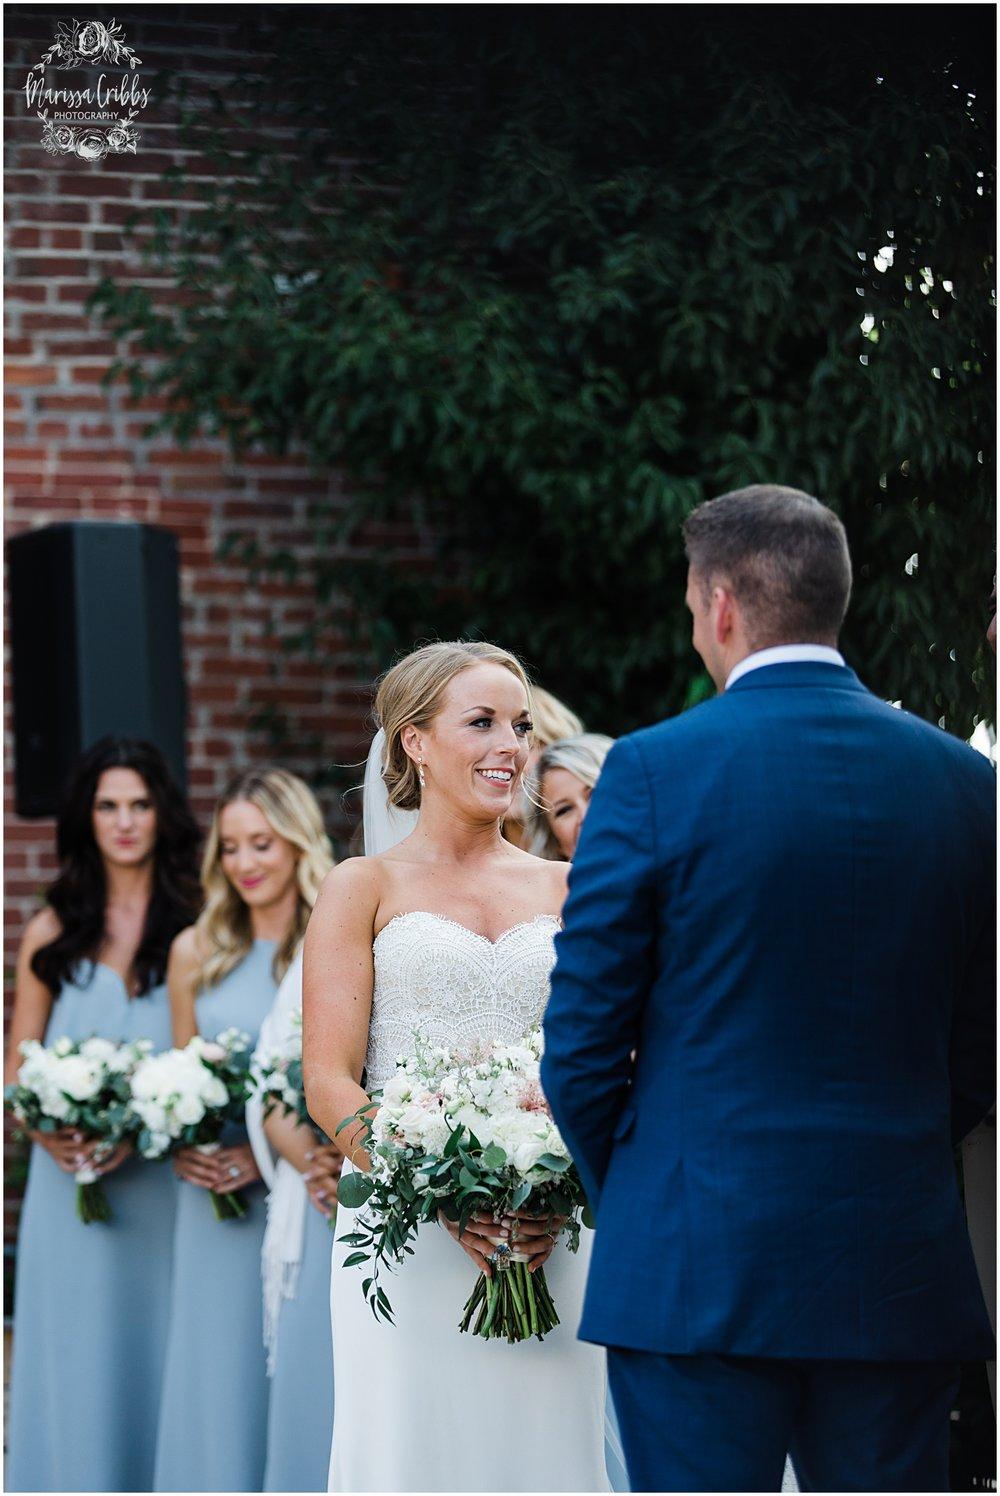 MAGNOLIA VENUE WEDDING | CHARLIE & NATALIE | MARISSA CRIBBS PHOTOGRAPHY_5756.jpg